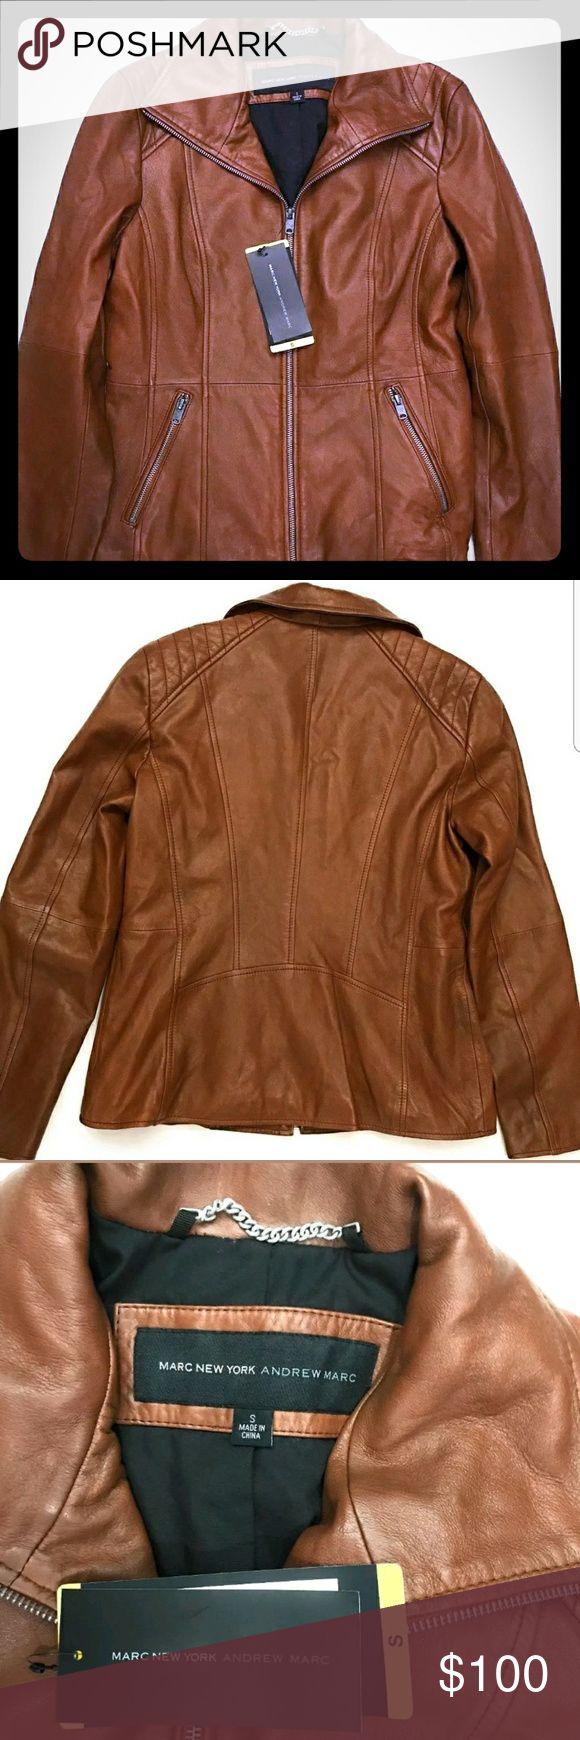 BEAUTIFUL cognac lambskin leather Marc New York.  New with tags. BEAUTIFUL cognac color. Lambskin leather. Marc New York Jackets & Coats